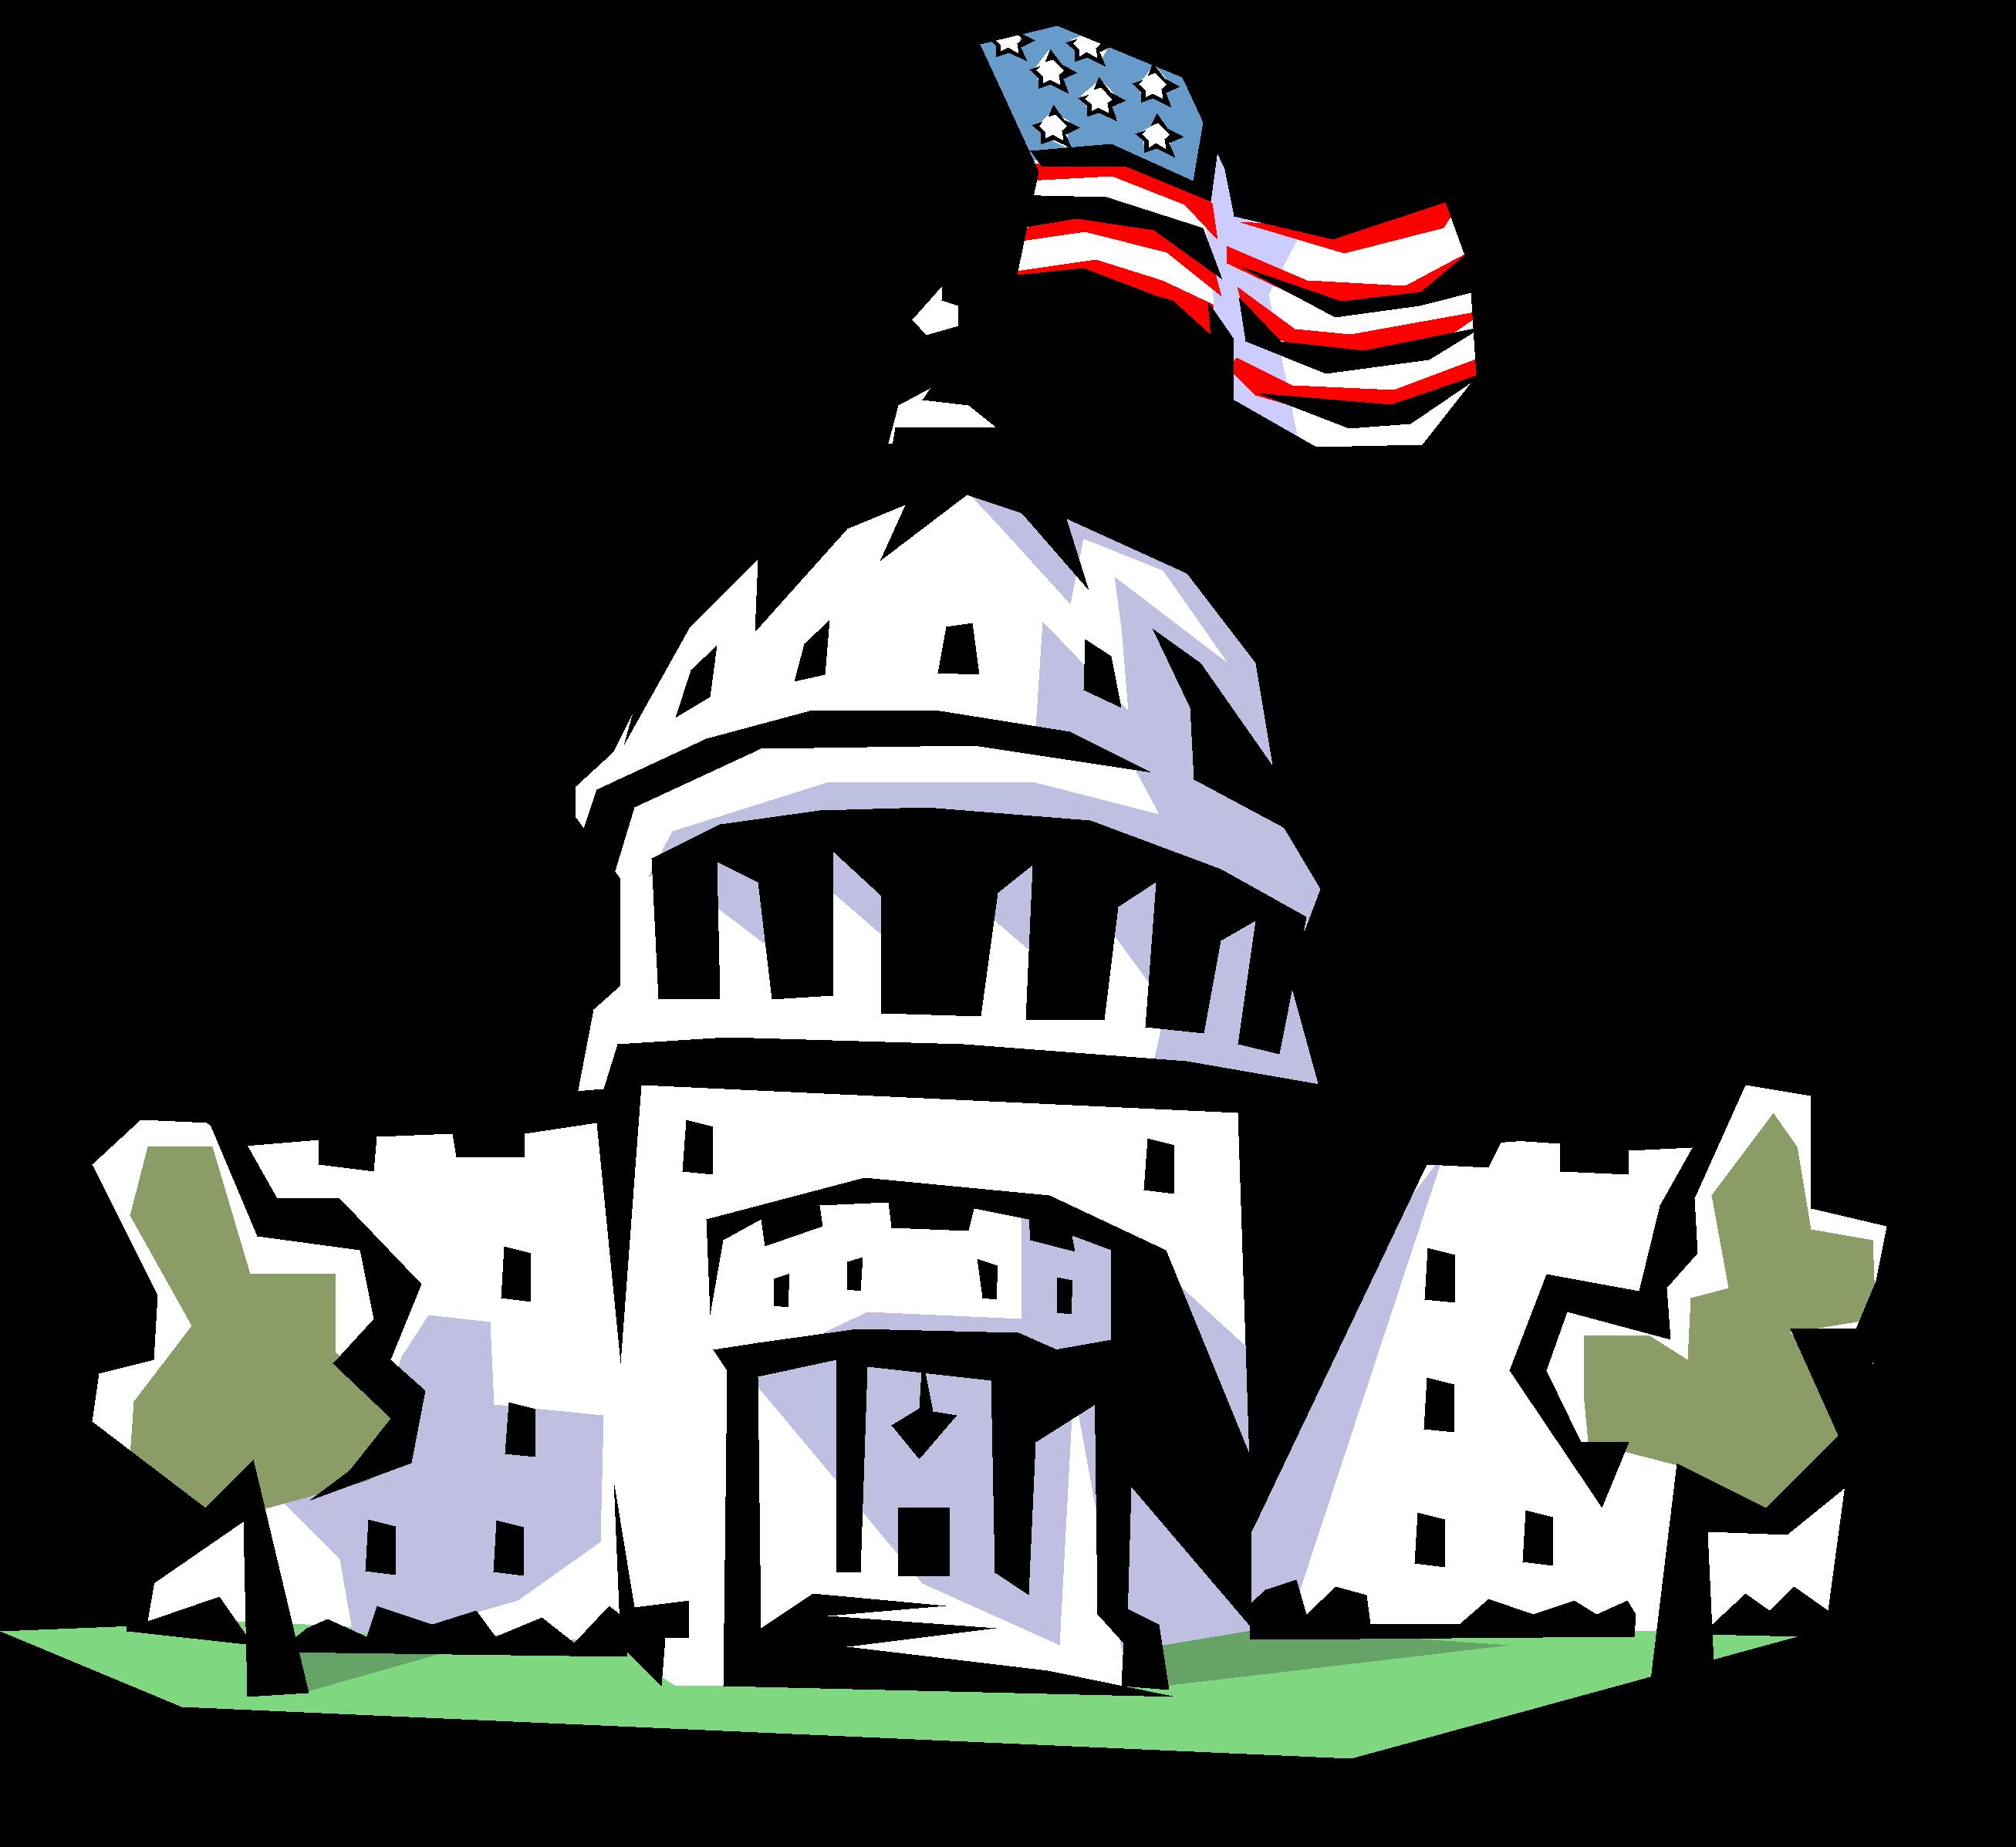 house of representatives and senate clipart drawing